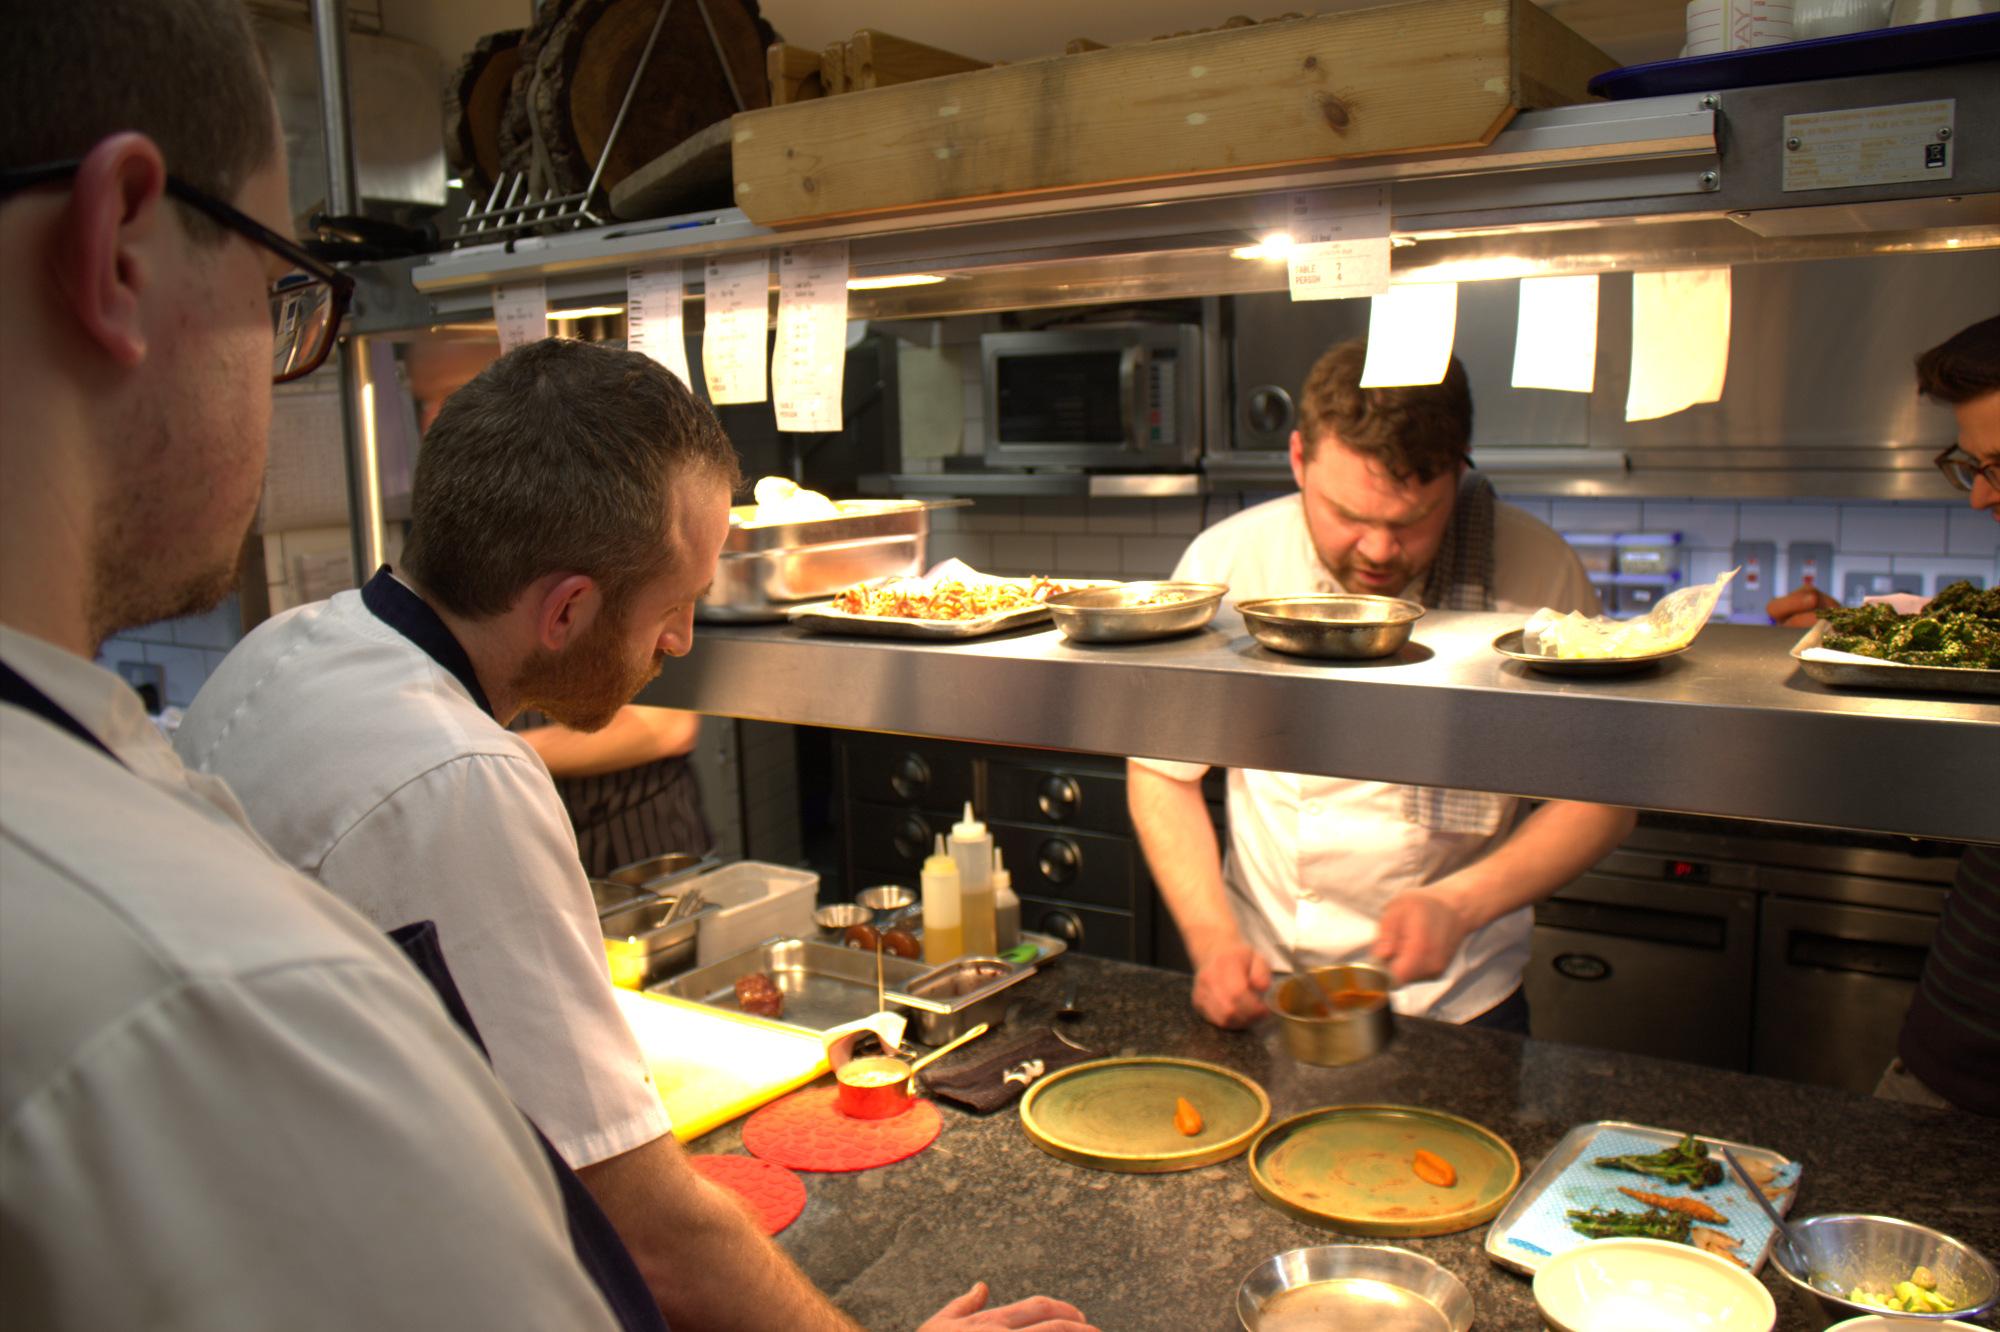 Chef Owner: Josh Eggleton - Cuisine: Modern BritishMichelin: One StarAA: Two RosettesTwitter: @theponyandtrapInstagram: @theponyandtrapAddress: Knowle Hill, Chew Magna, Bristol, BS40 8TQPhone: 01275 332627 Website: theponyandtrap.co.uk